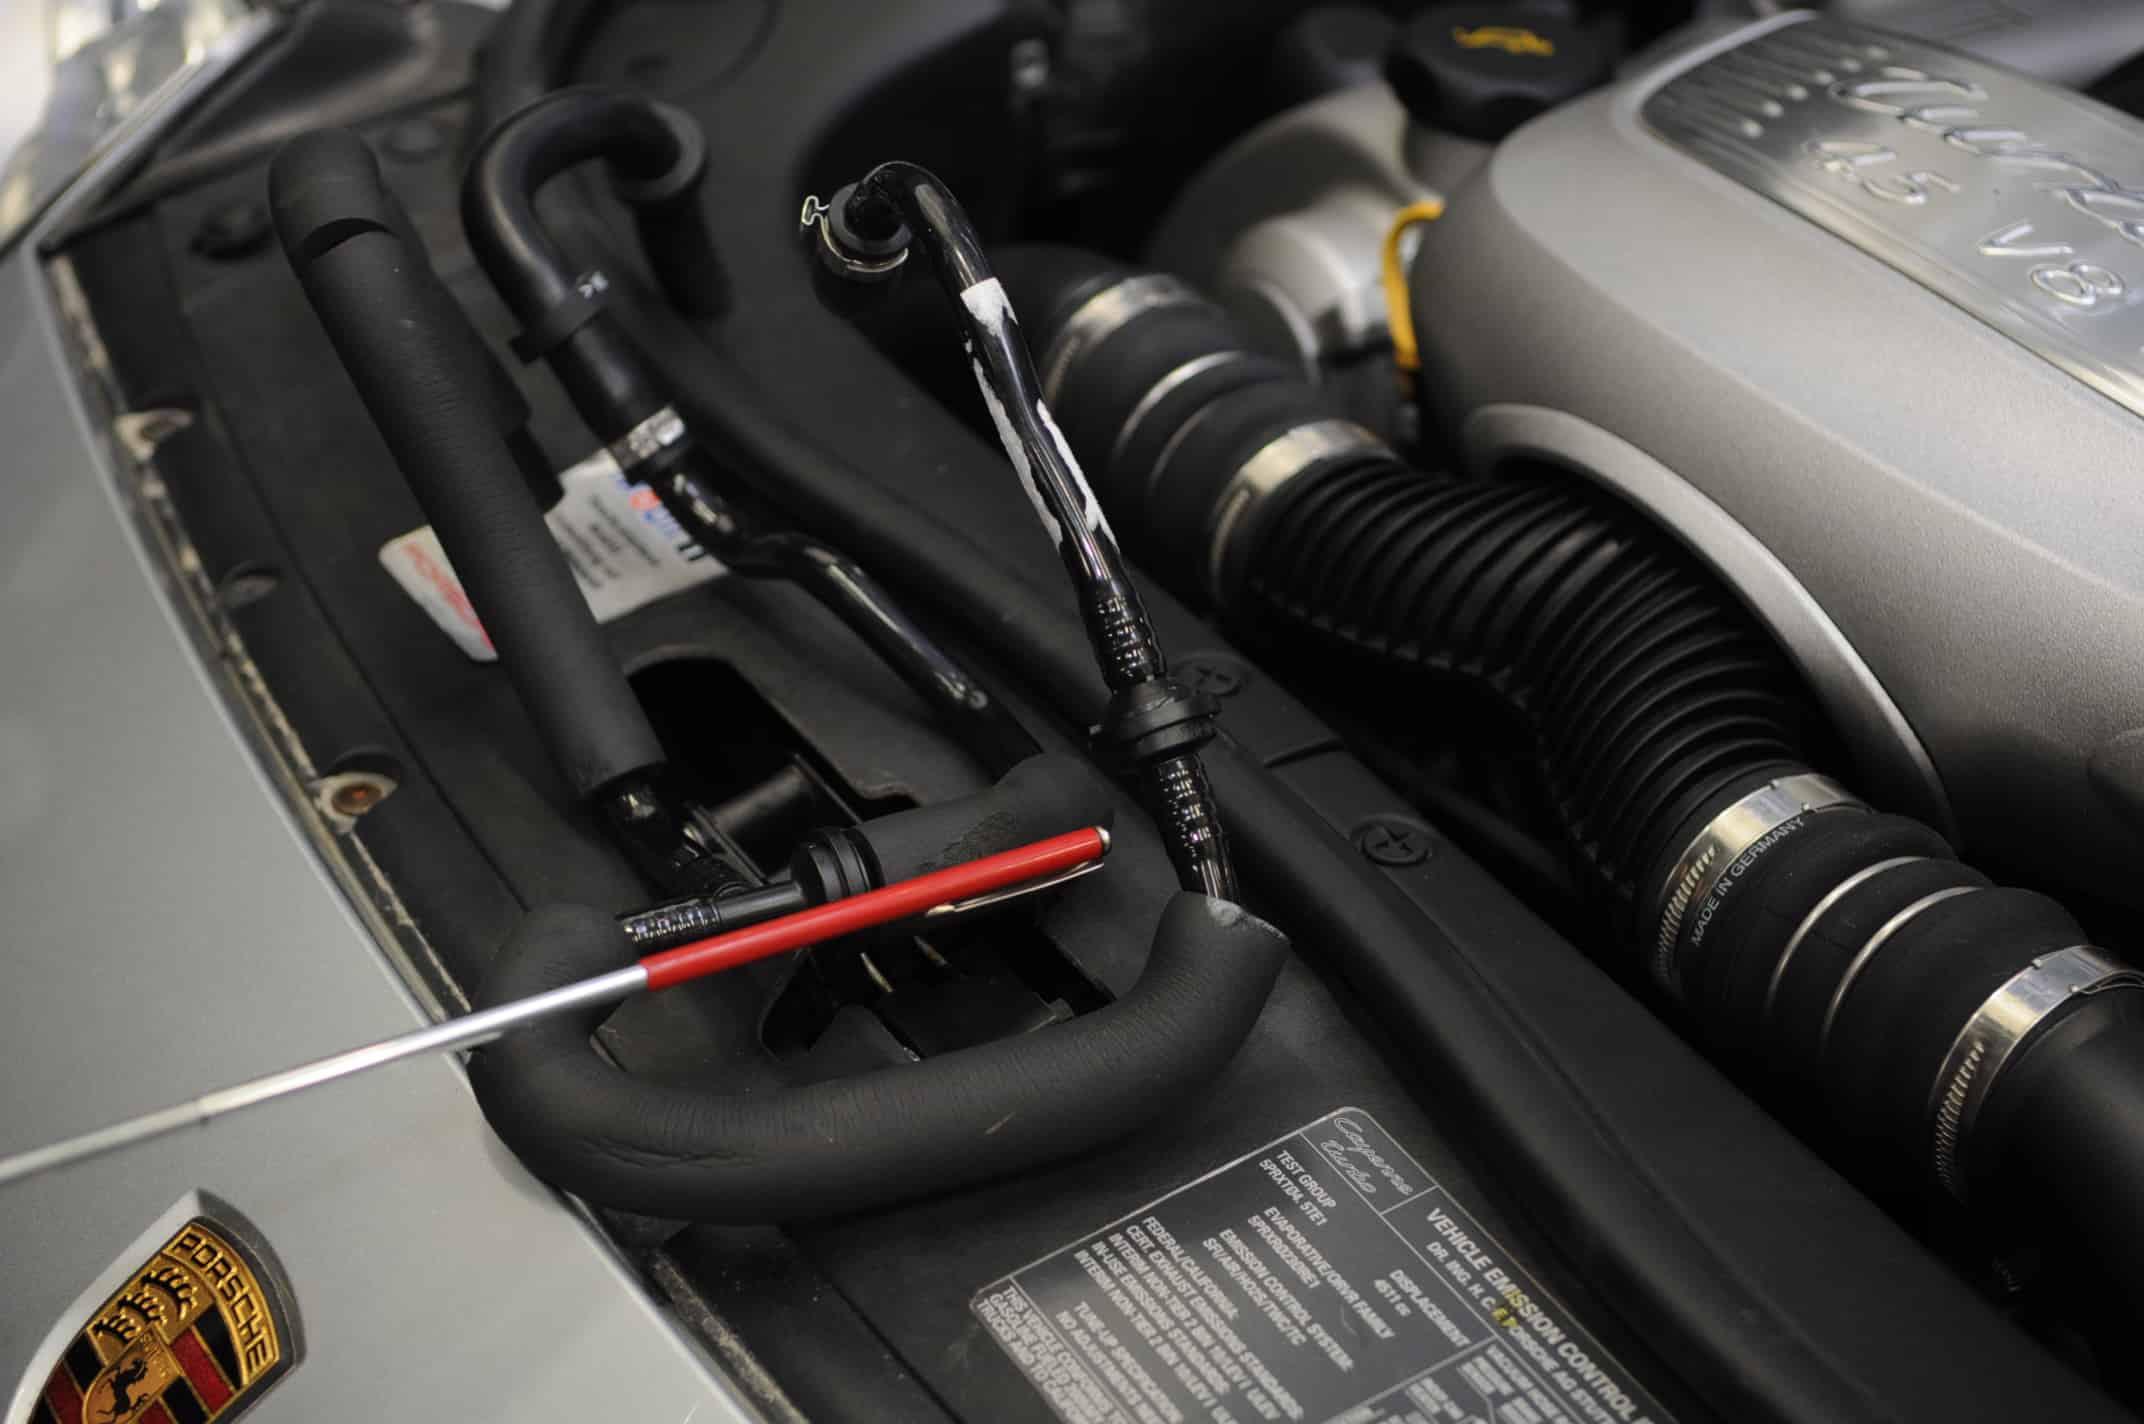 2005 Porsche Cayenne Turbo S 45l V8 Brake Booster Faulty